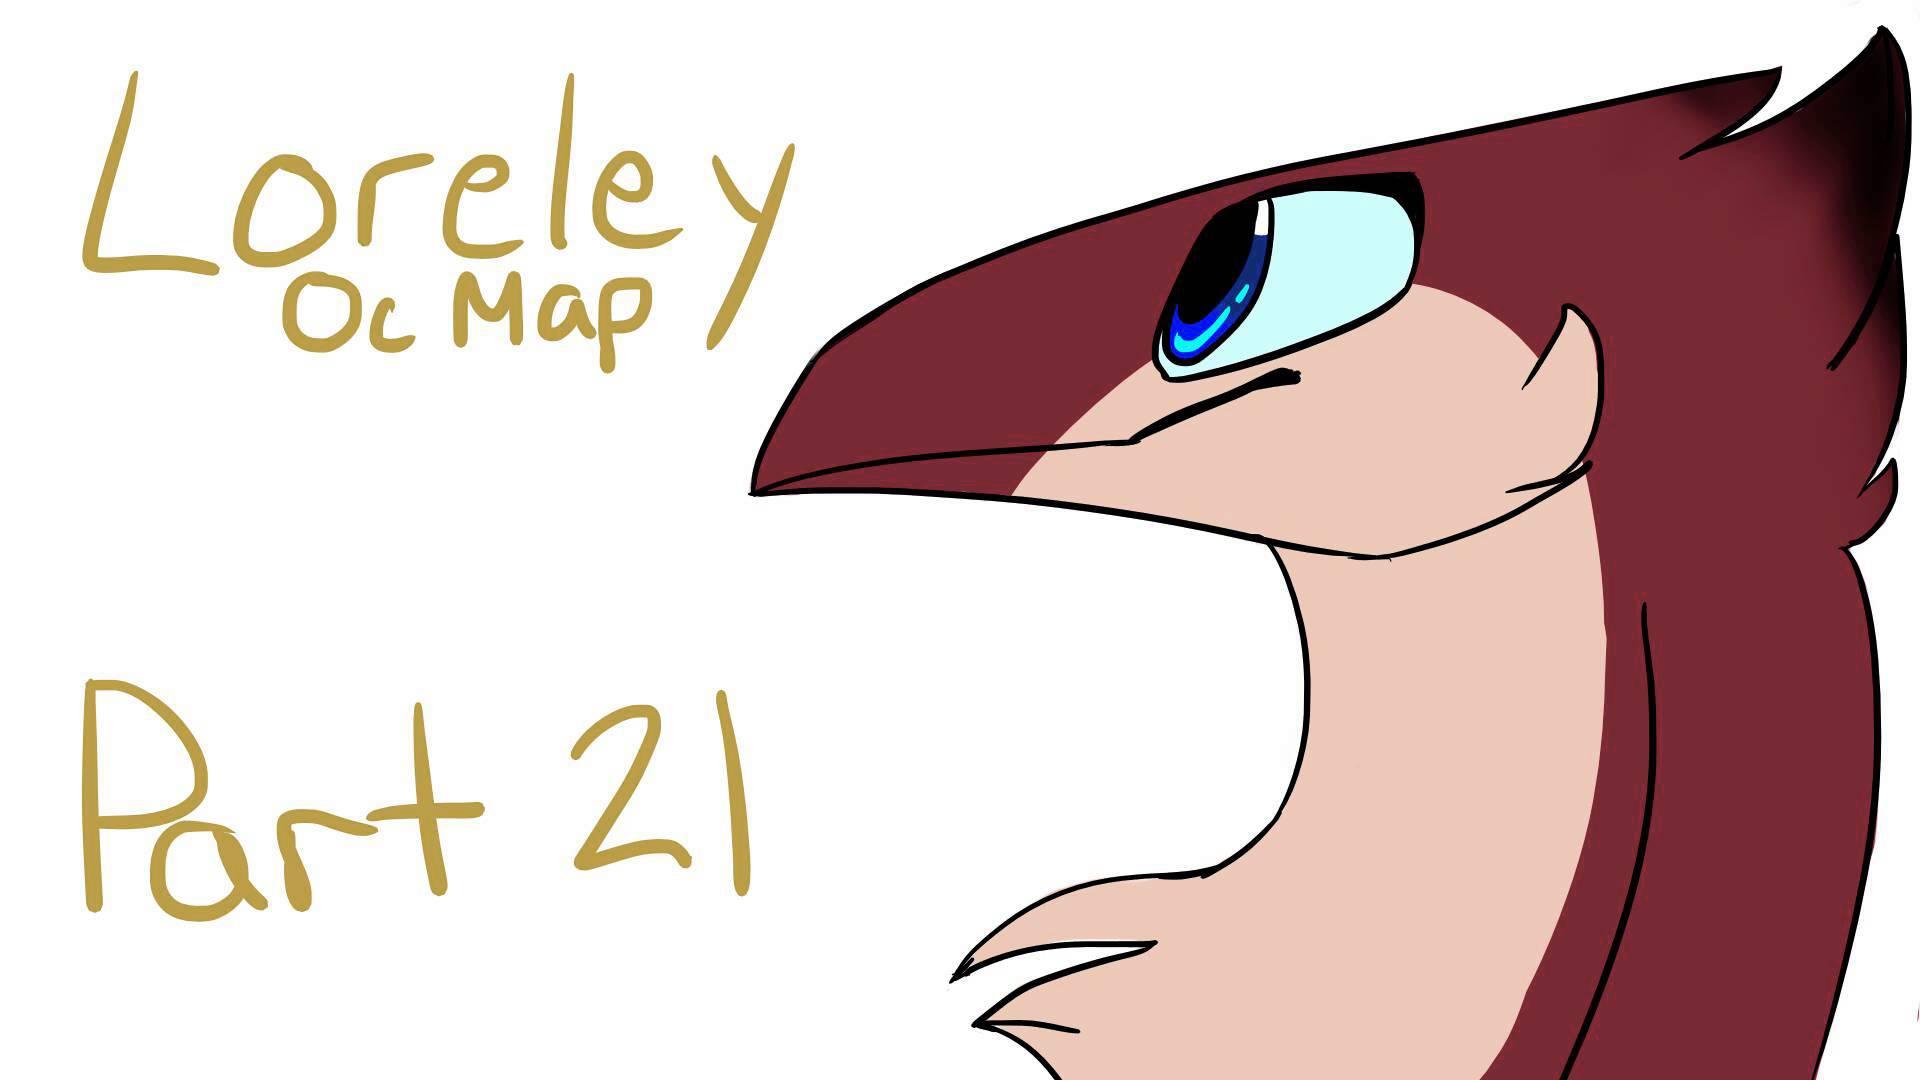 Loreley Oc Map (CLOSED) (35/41 DONE).